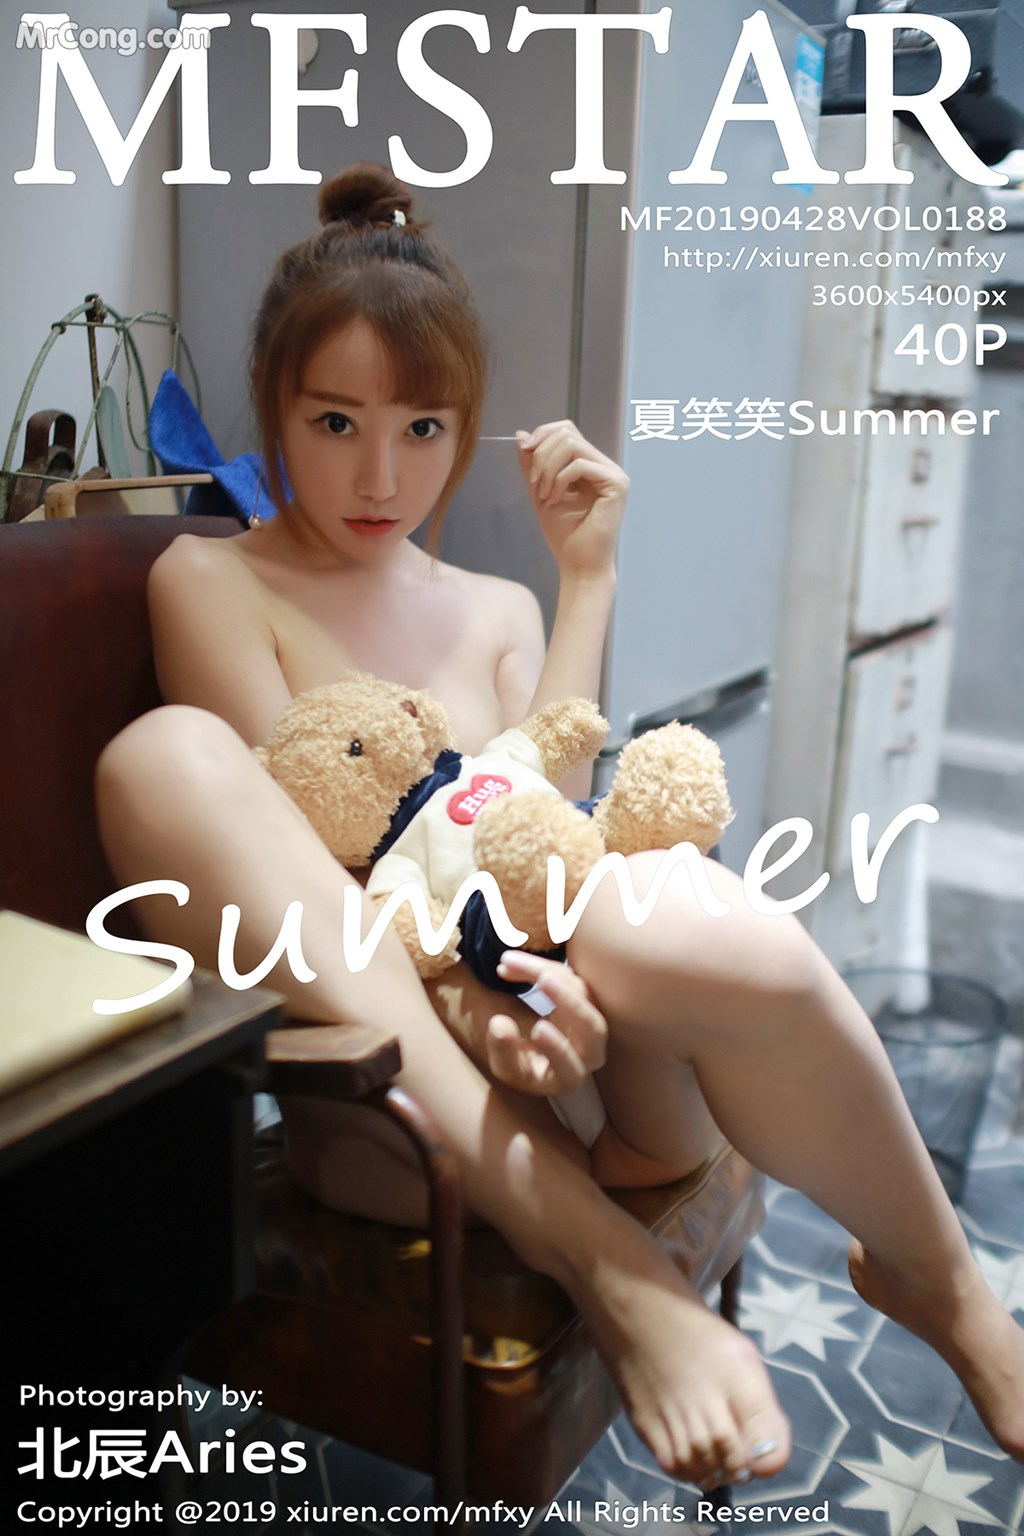 MFStar Vol.188: Xia Xiao Xiao (夏 笑笑 Summer) (41 photos)